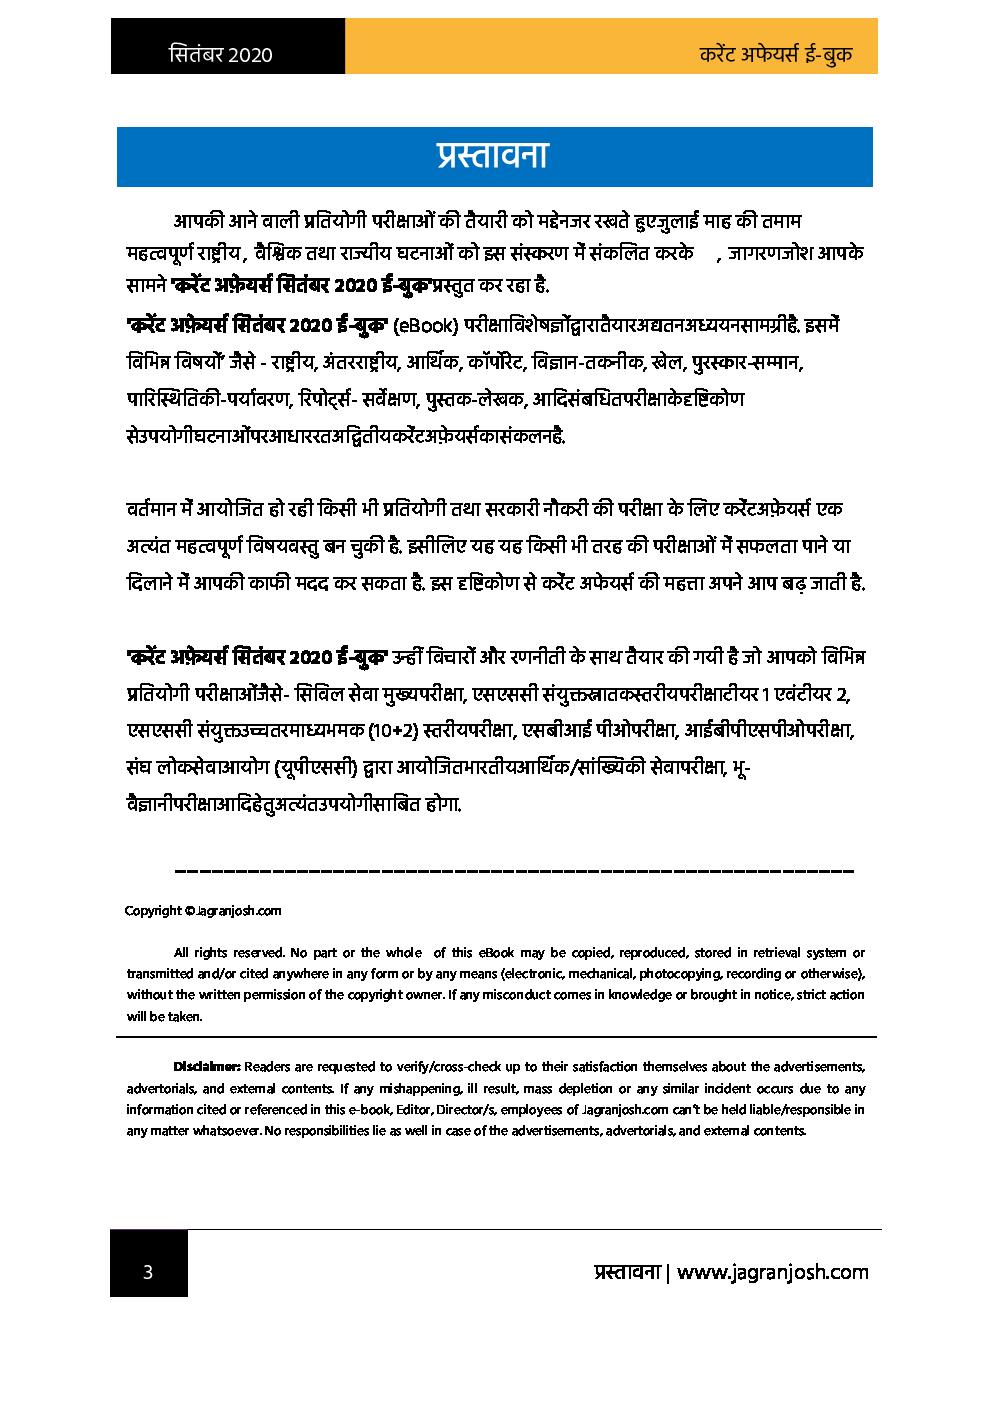 करेंट अफेयर्स सितम्बर 2020 ई-बुक - Page 3